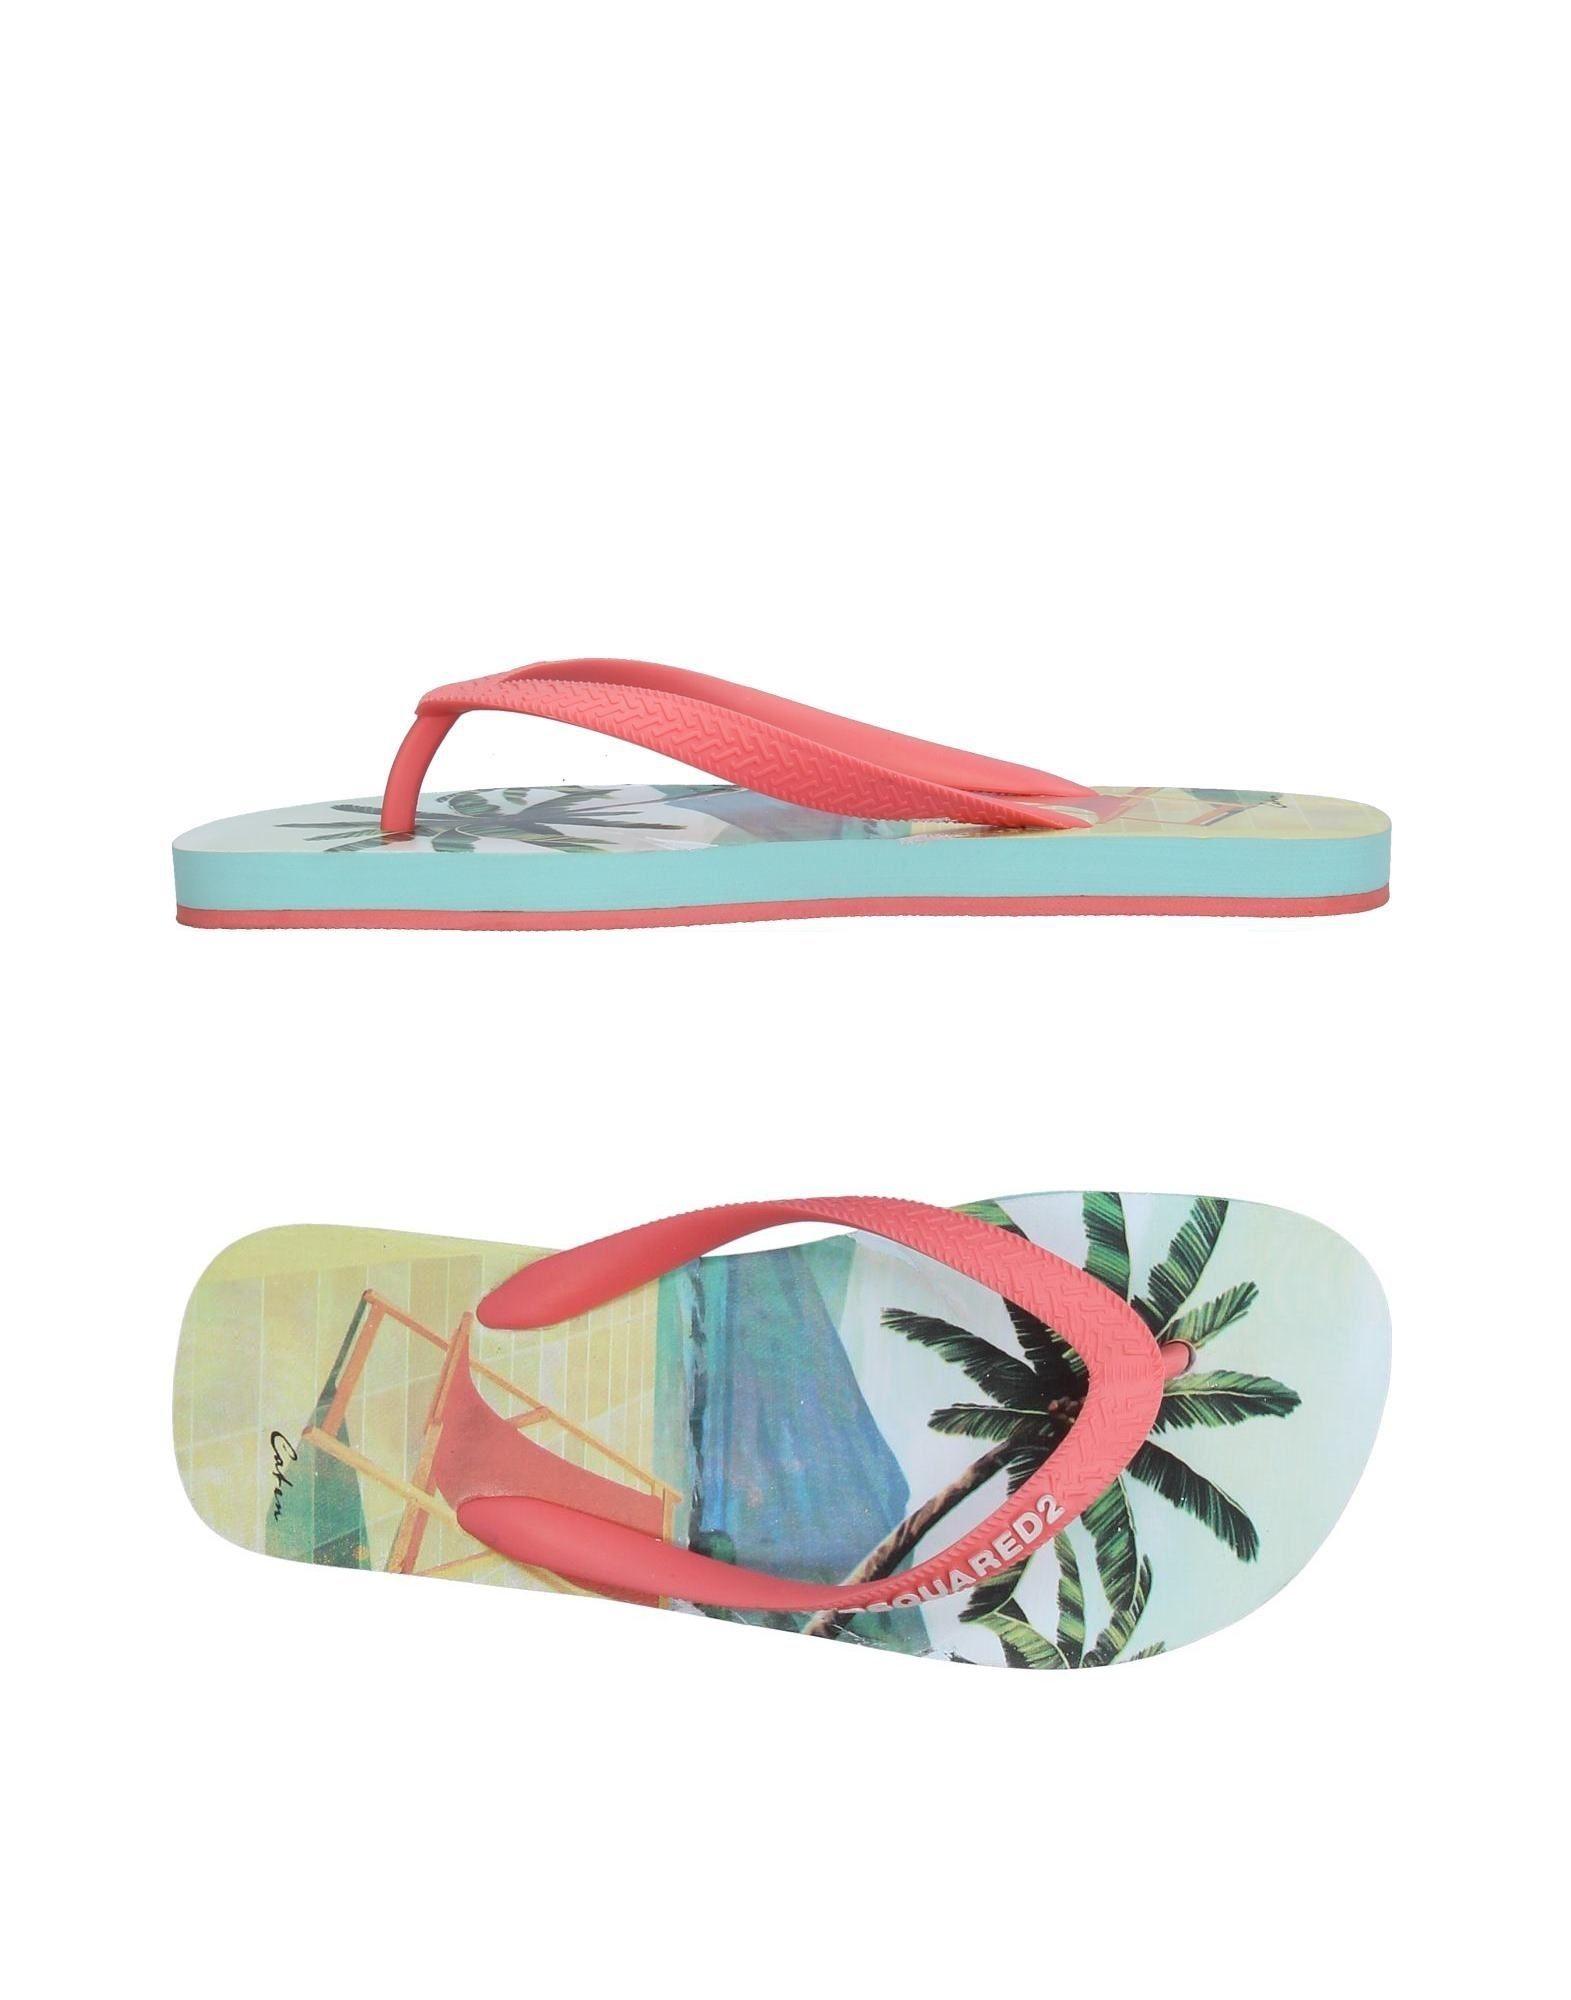 Dsquared2 Dianetten Damen  11333459OE Gute Qualität beliebte Schuhe